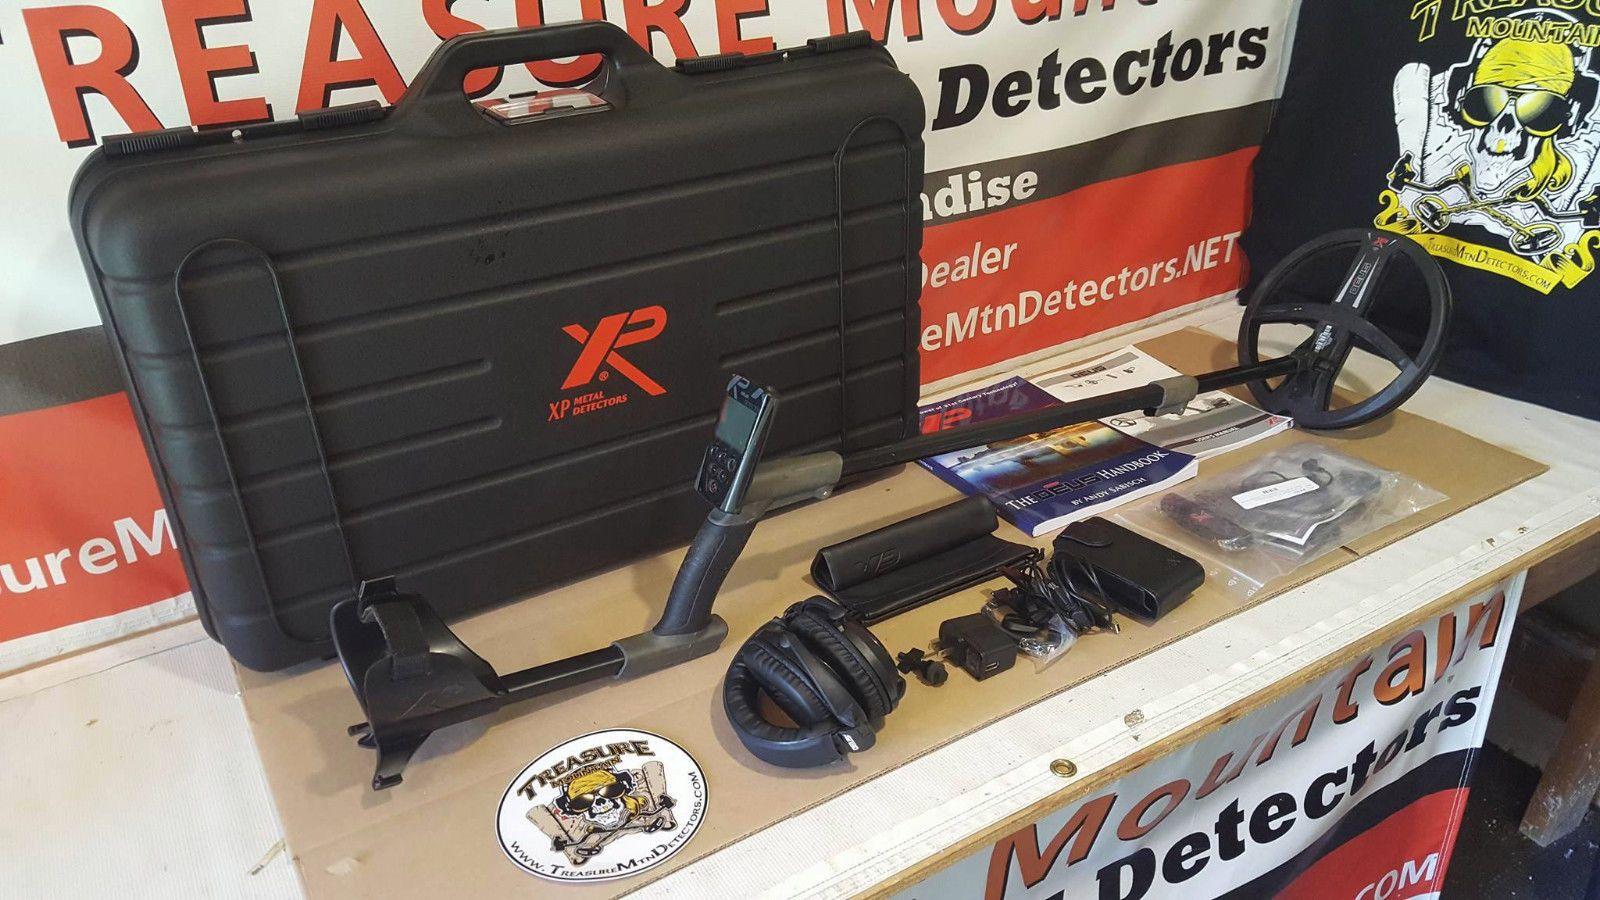 "Used XP Deus Metal Detector  Remote  9"" Coil  Hard Case  Water Kit  WS5 HP! https://t.co/avILwYQpFX https://t.co/ZjnkD3oDN4"